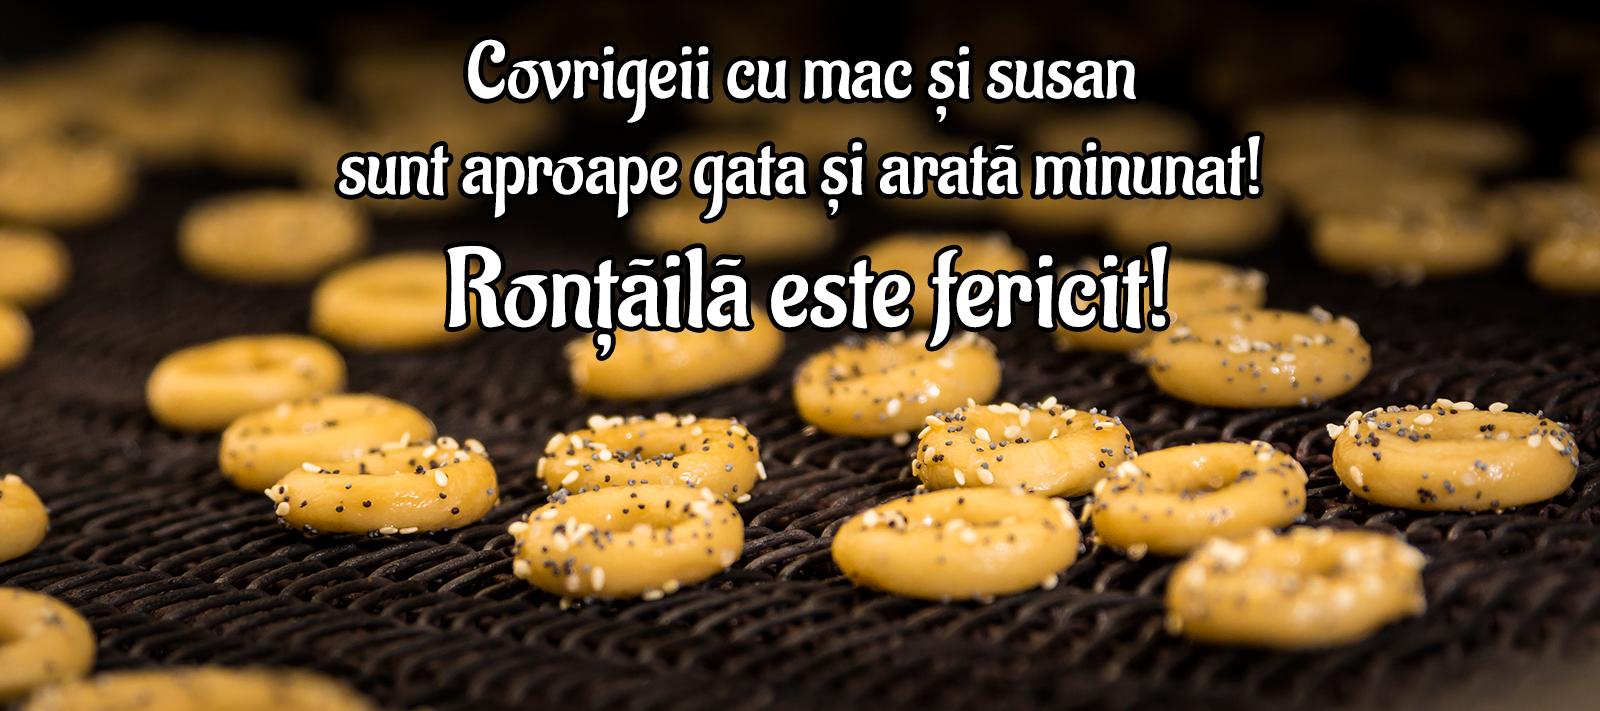 Covrigei sarati Rontaila - banner 1